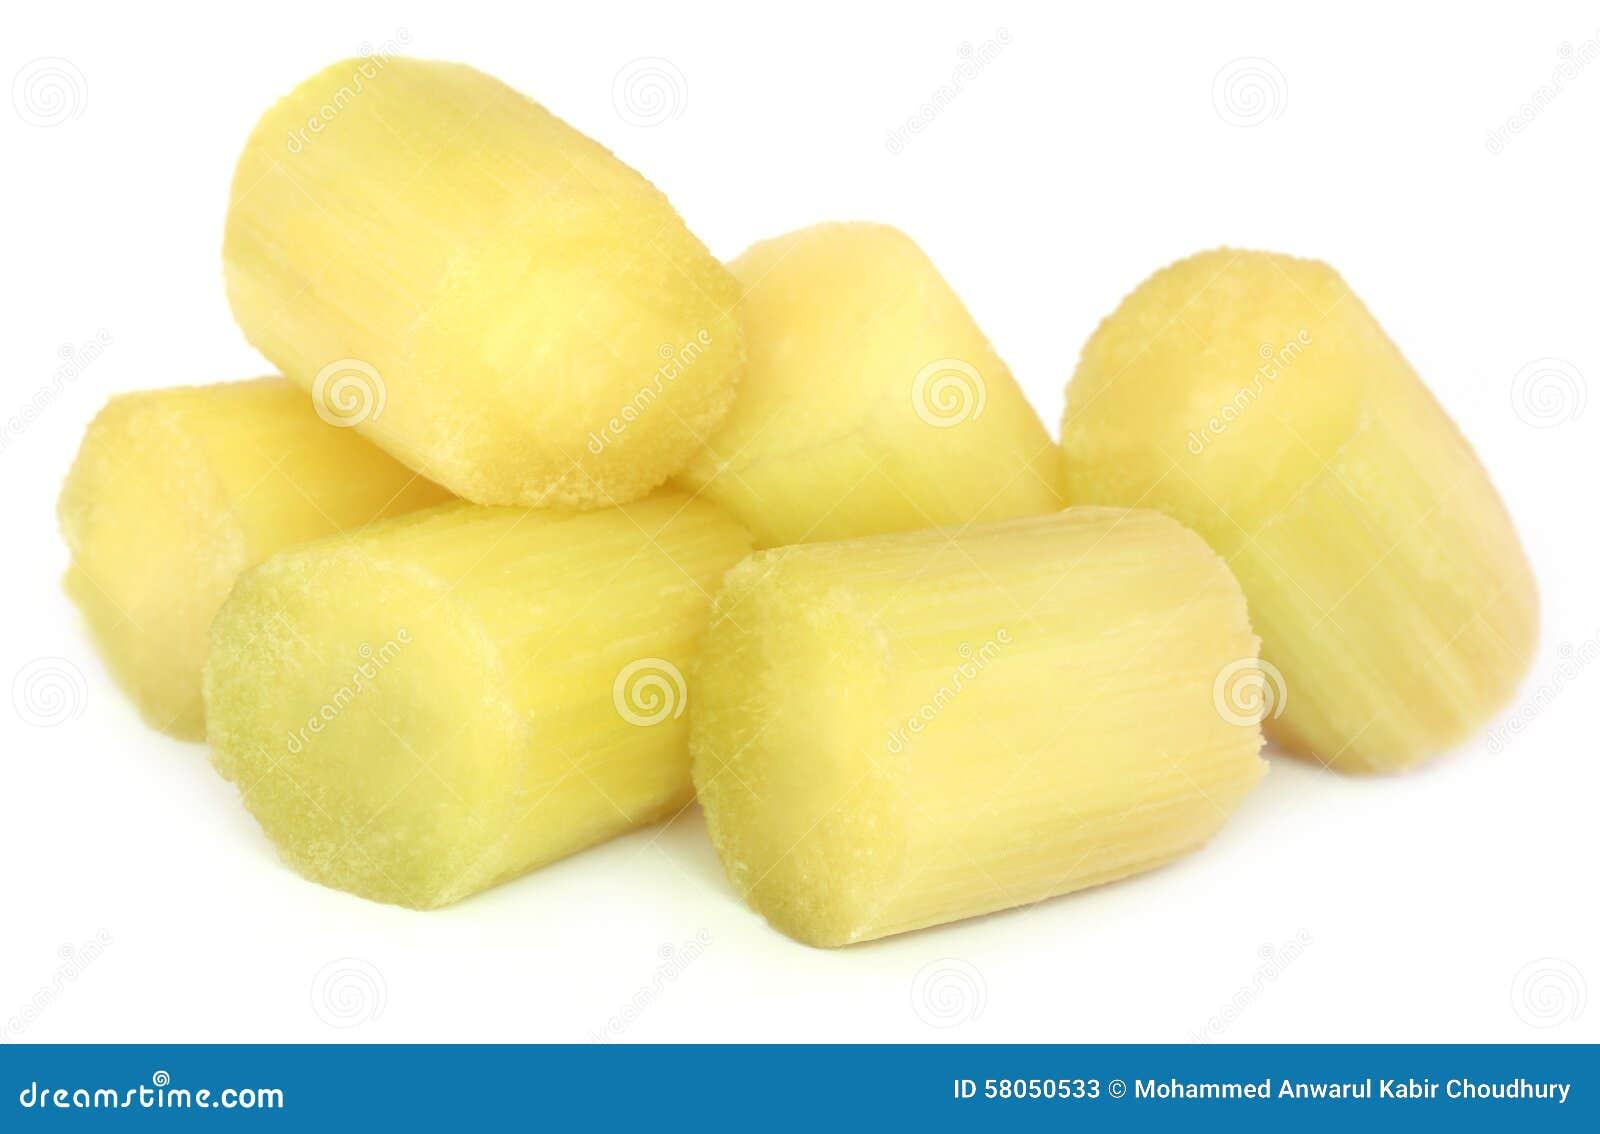 Pieces Of Sugarcane Stock Image. Image Of Peeled